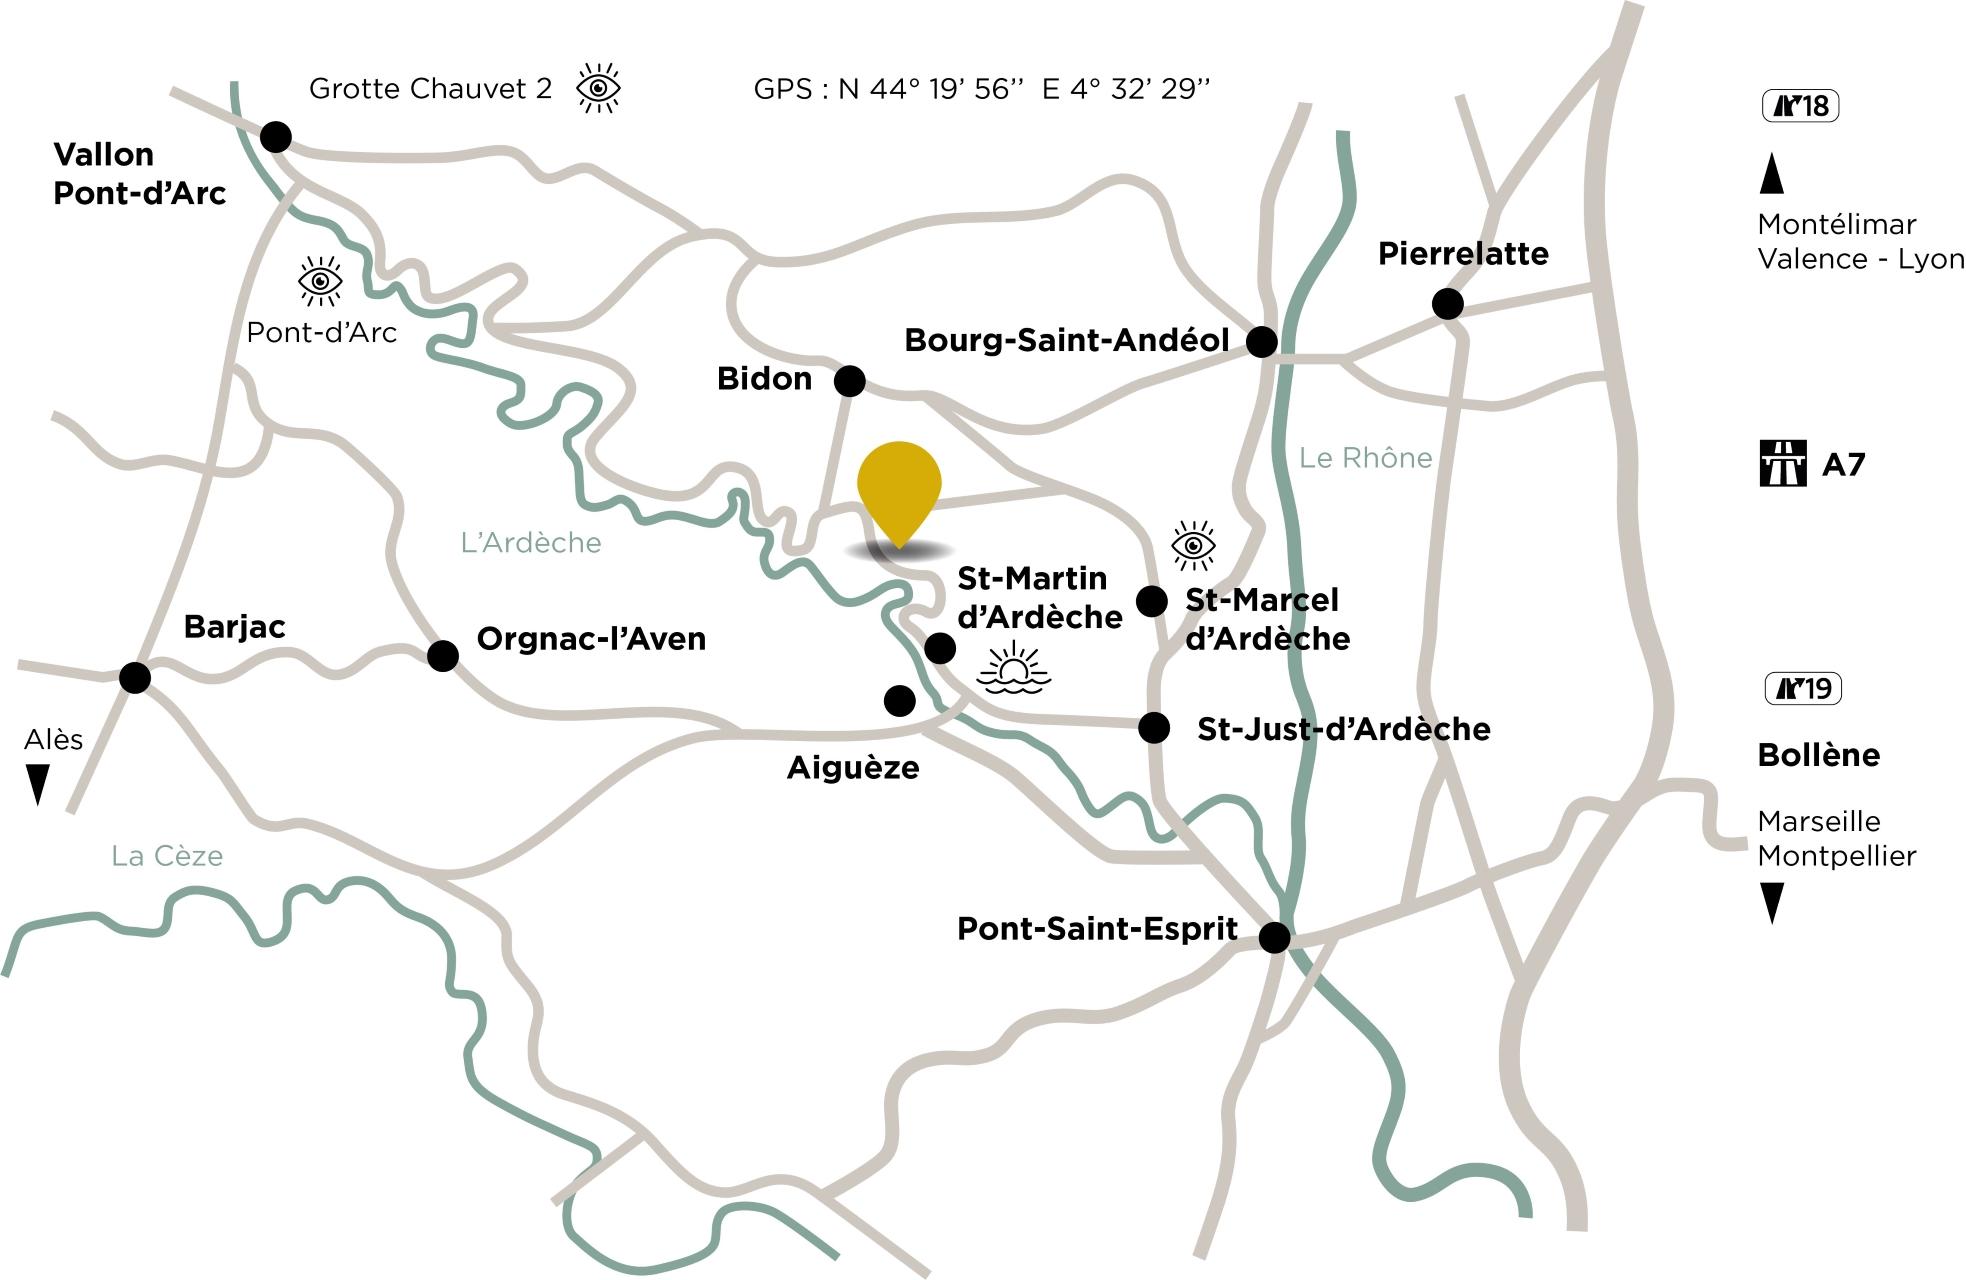 saint marcel cave ardeche access map motorway a7 montelimar or bollene exit